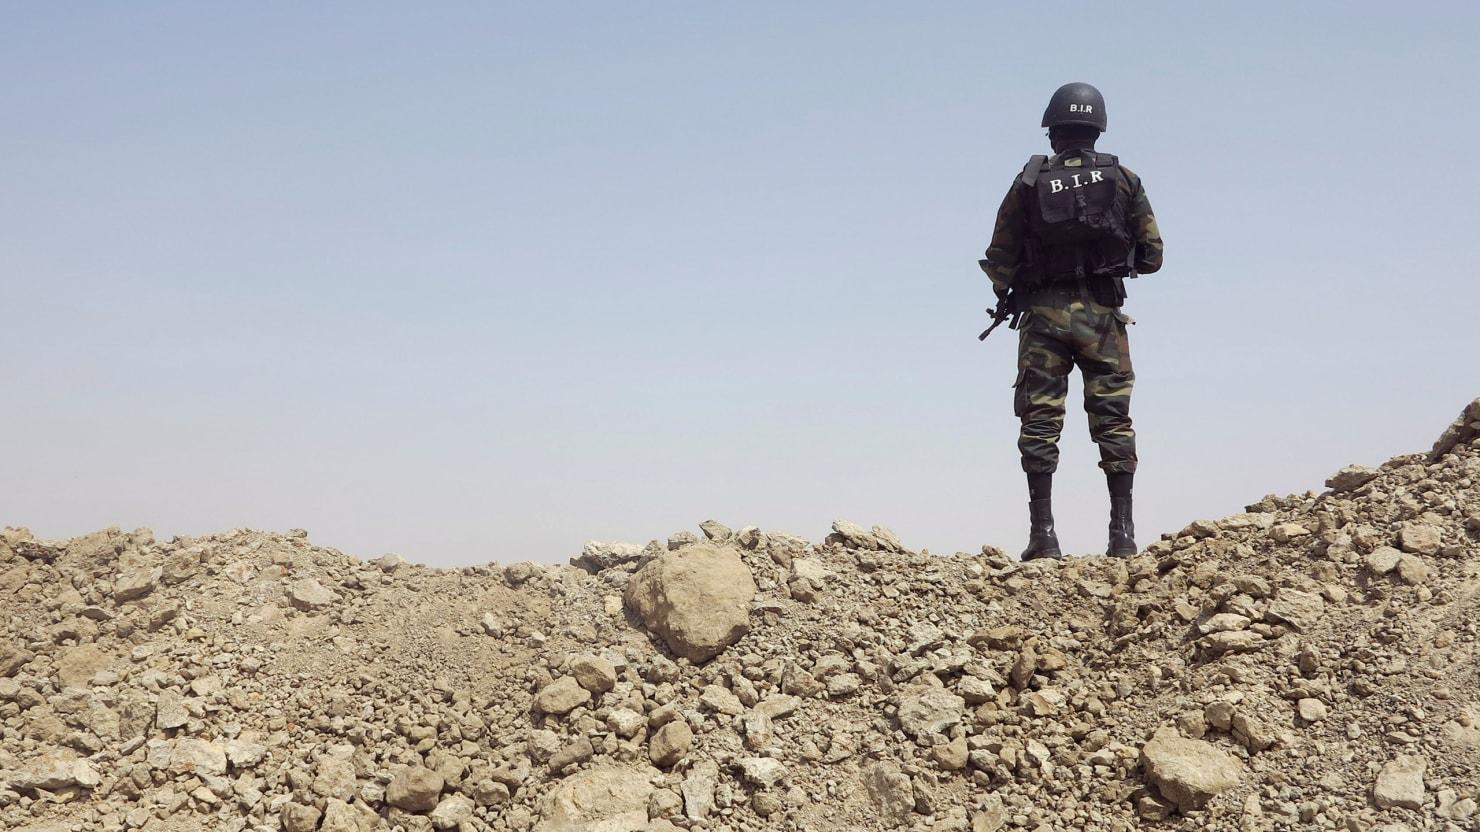 The Widening War Against Boko Haram